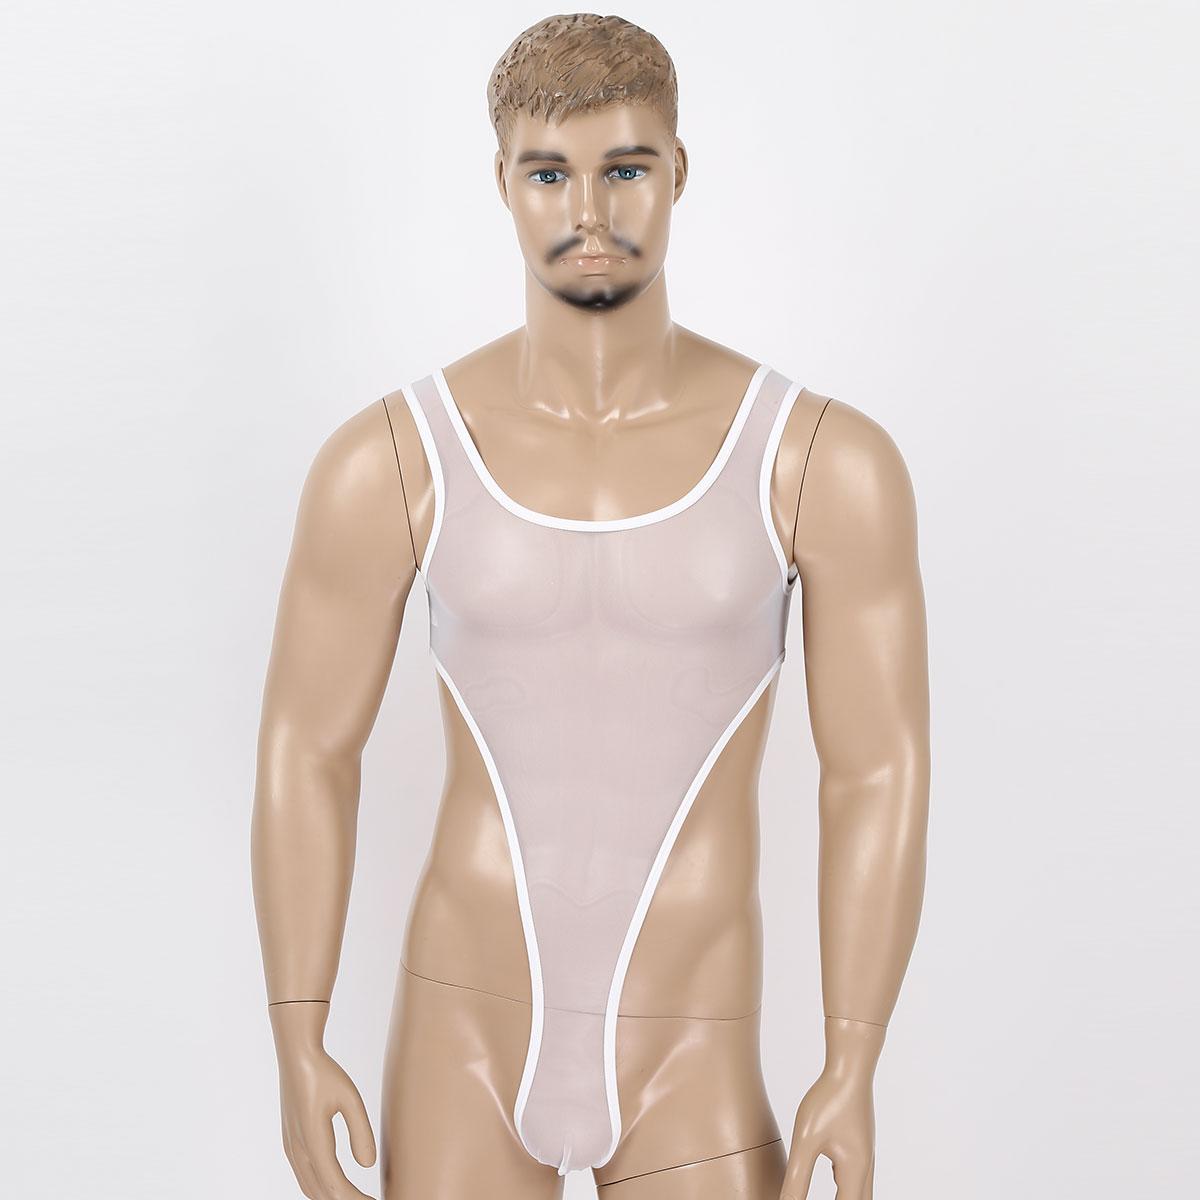 Mens One-piece See Through Sheer Mesh Undershirts U Neck Sleeveless High Cut Leotard Bodysuit Gay Wrestling Singlet Underwear